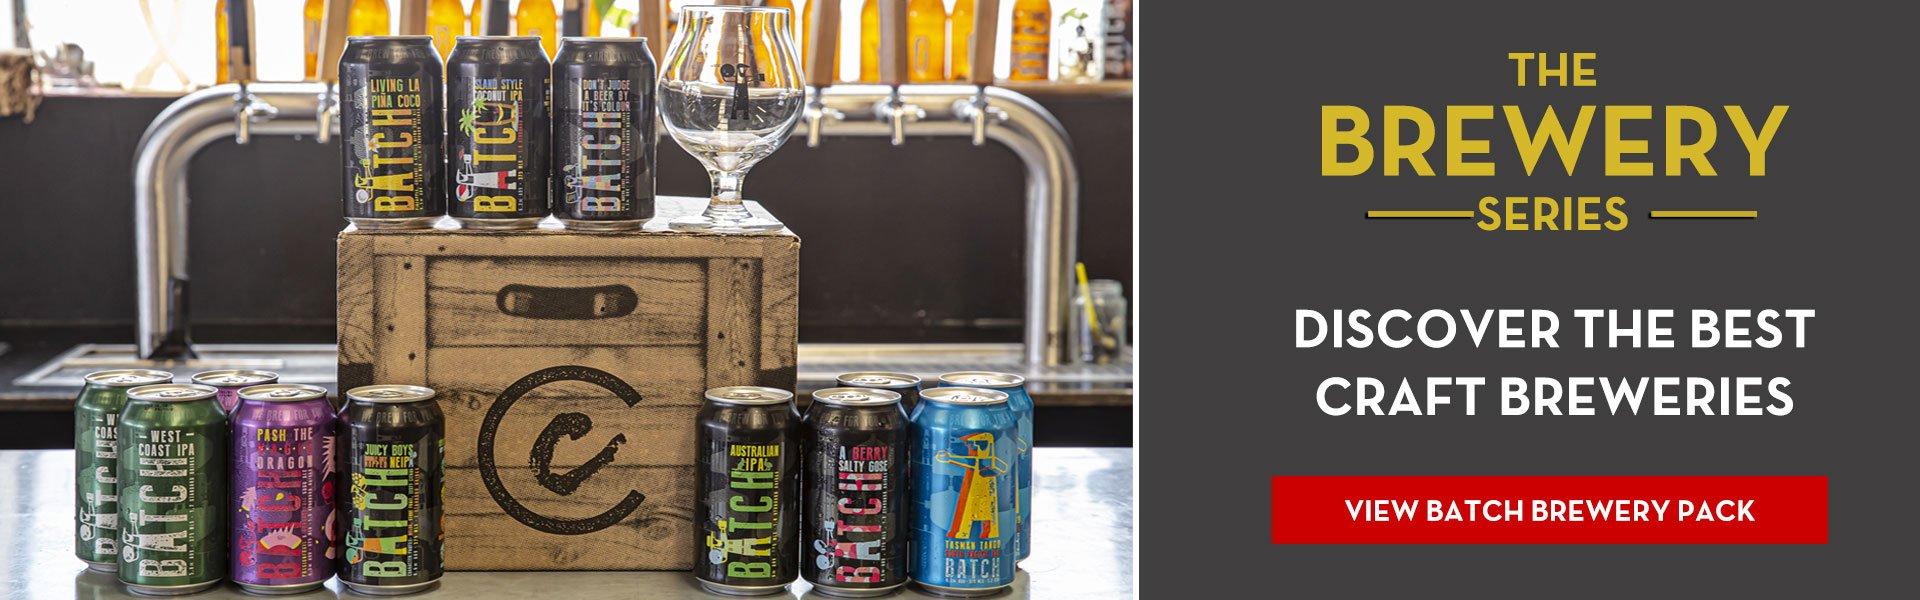 Batch-Brewery-Pack-banner-website